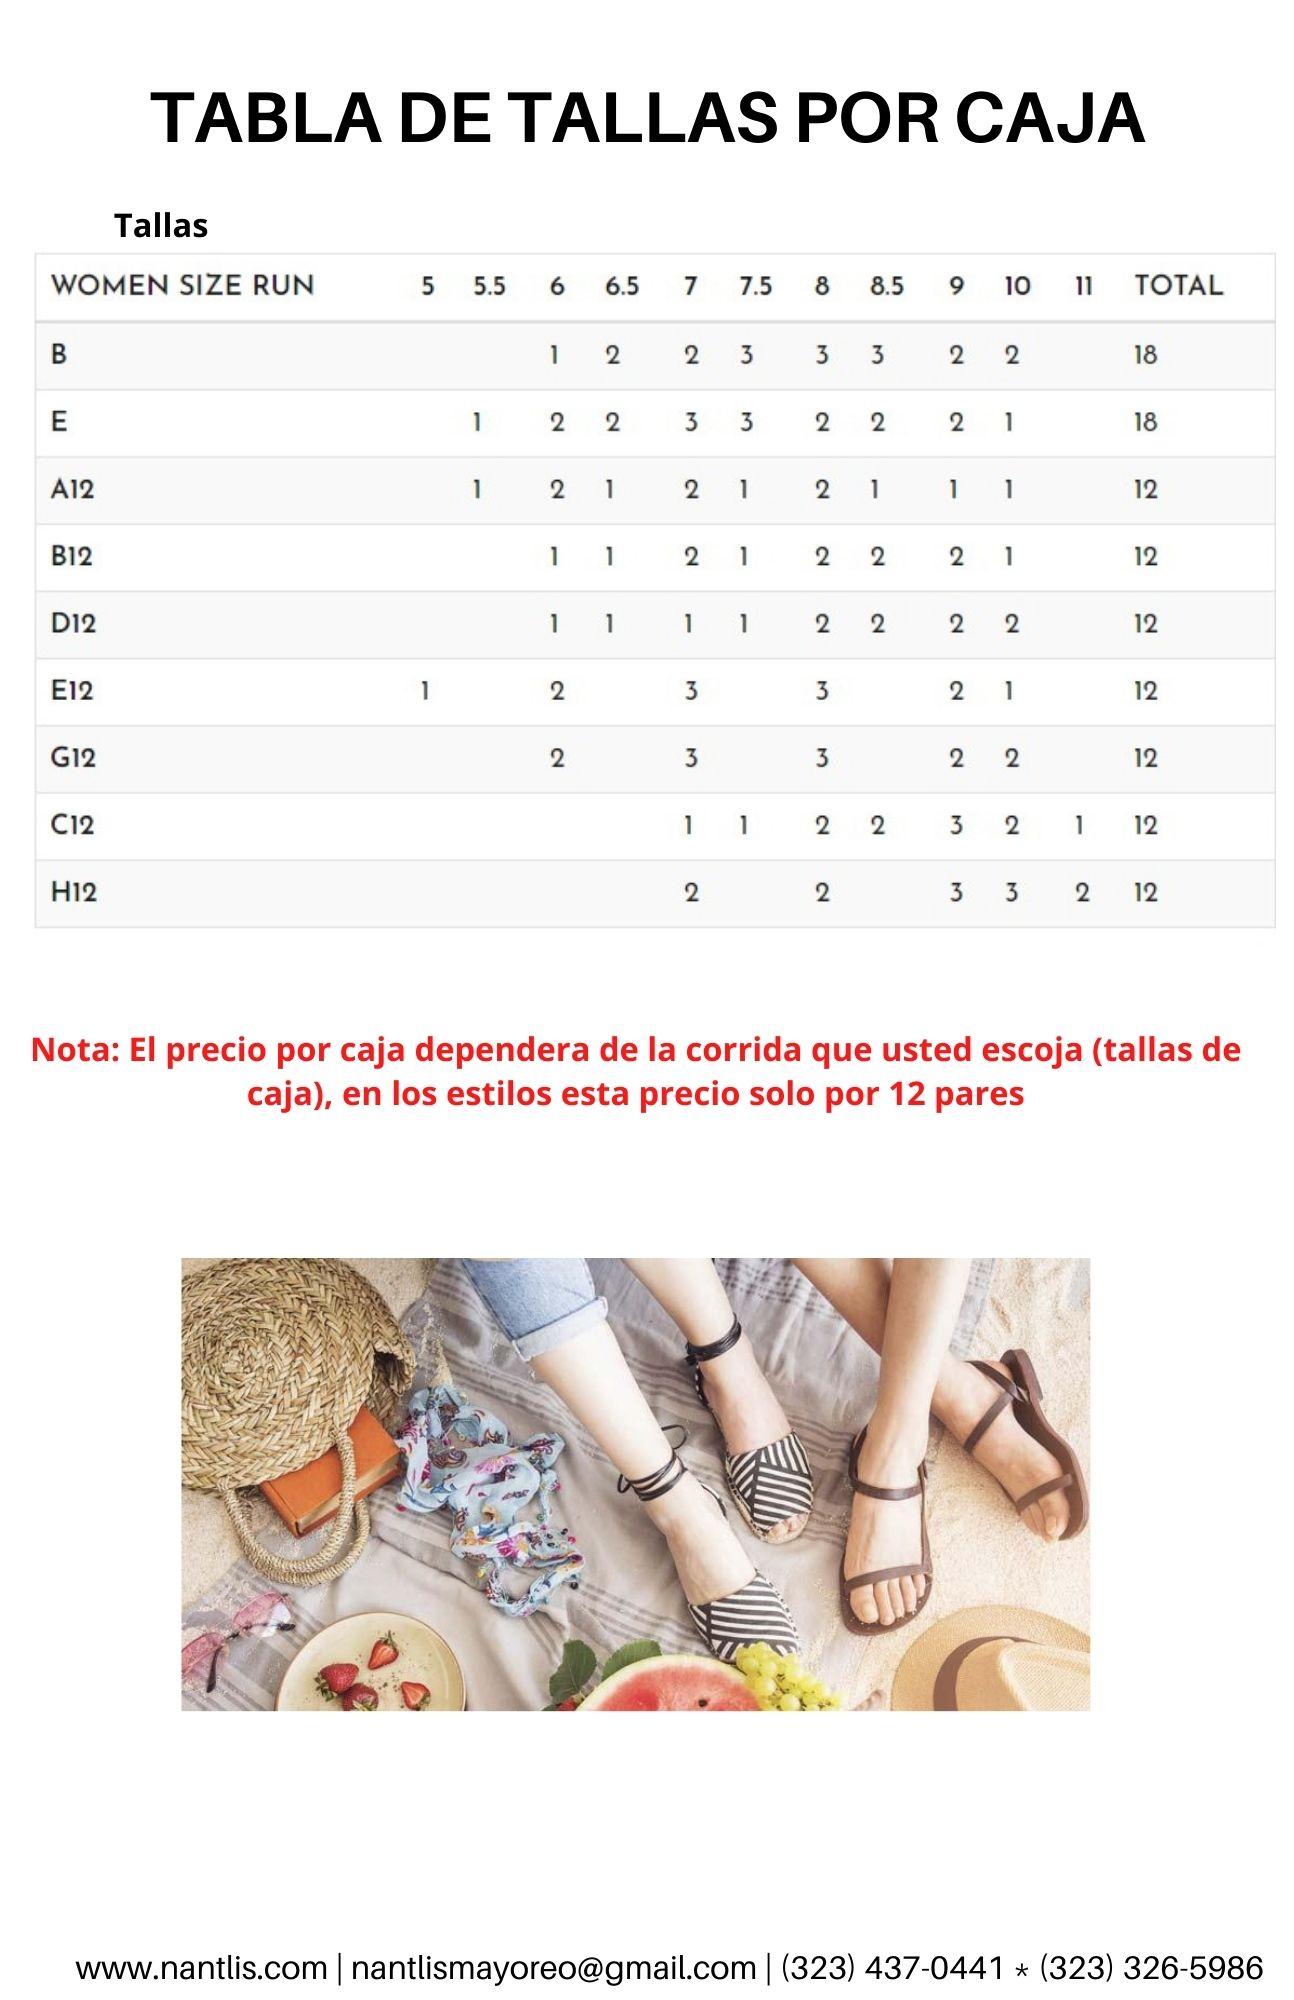 Catalogo Vol QU44 Sandalias de mujer mayoreo Wholesale Sandals page 09